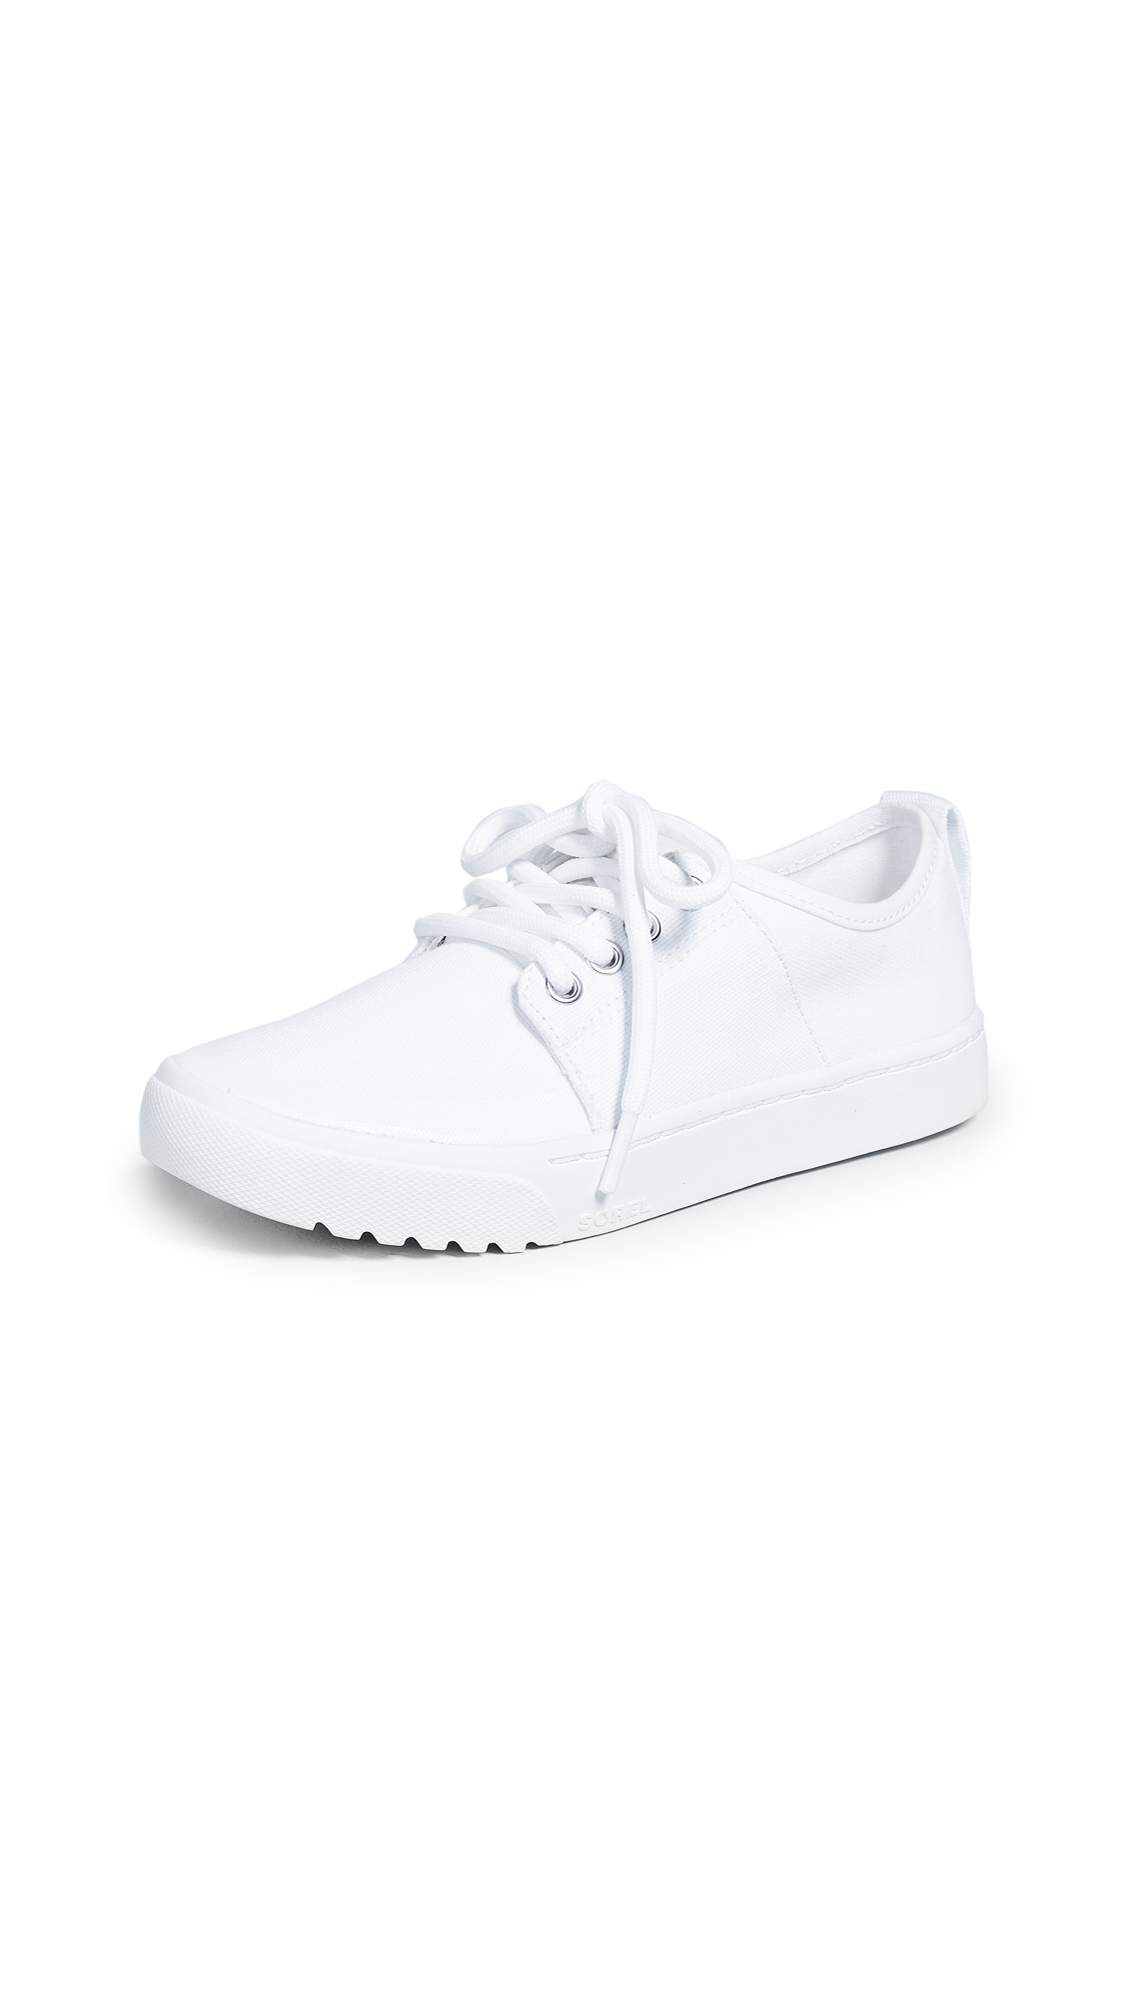 Sorel Campsneak Lace Up Sneakers - White